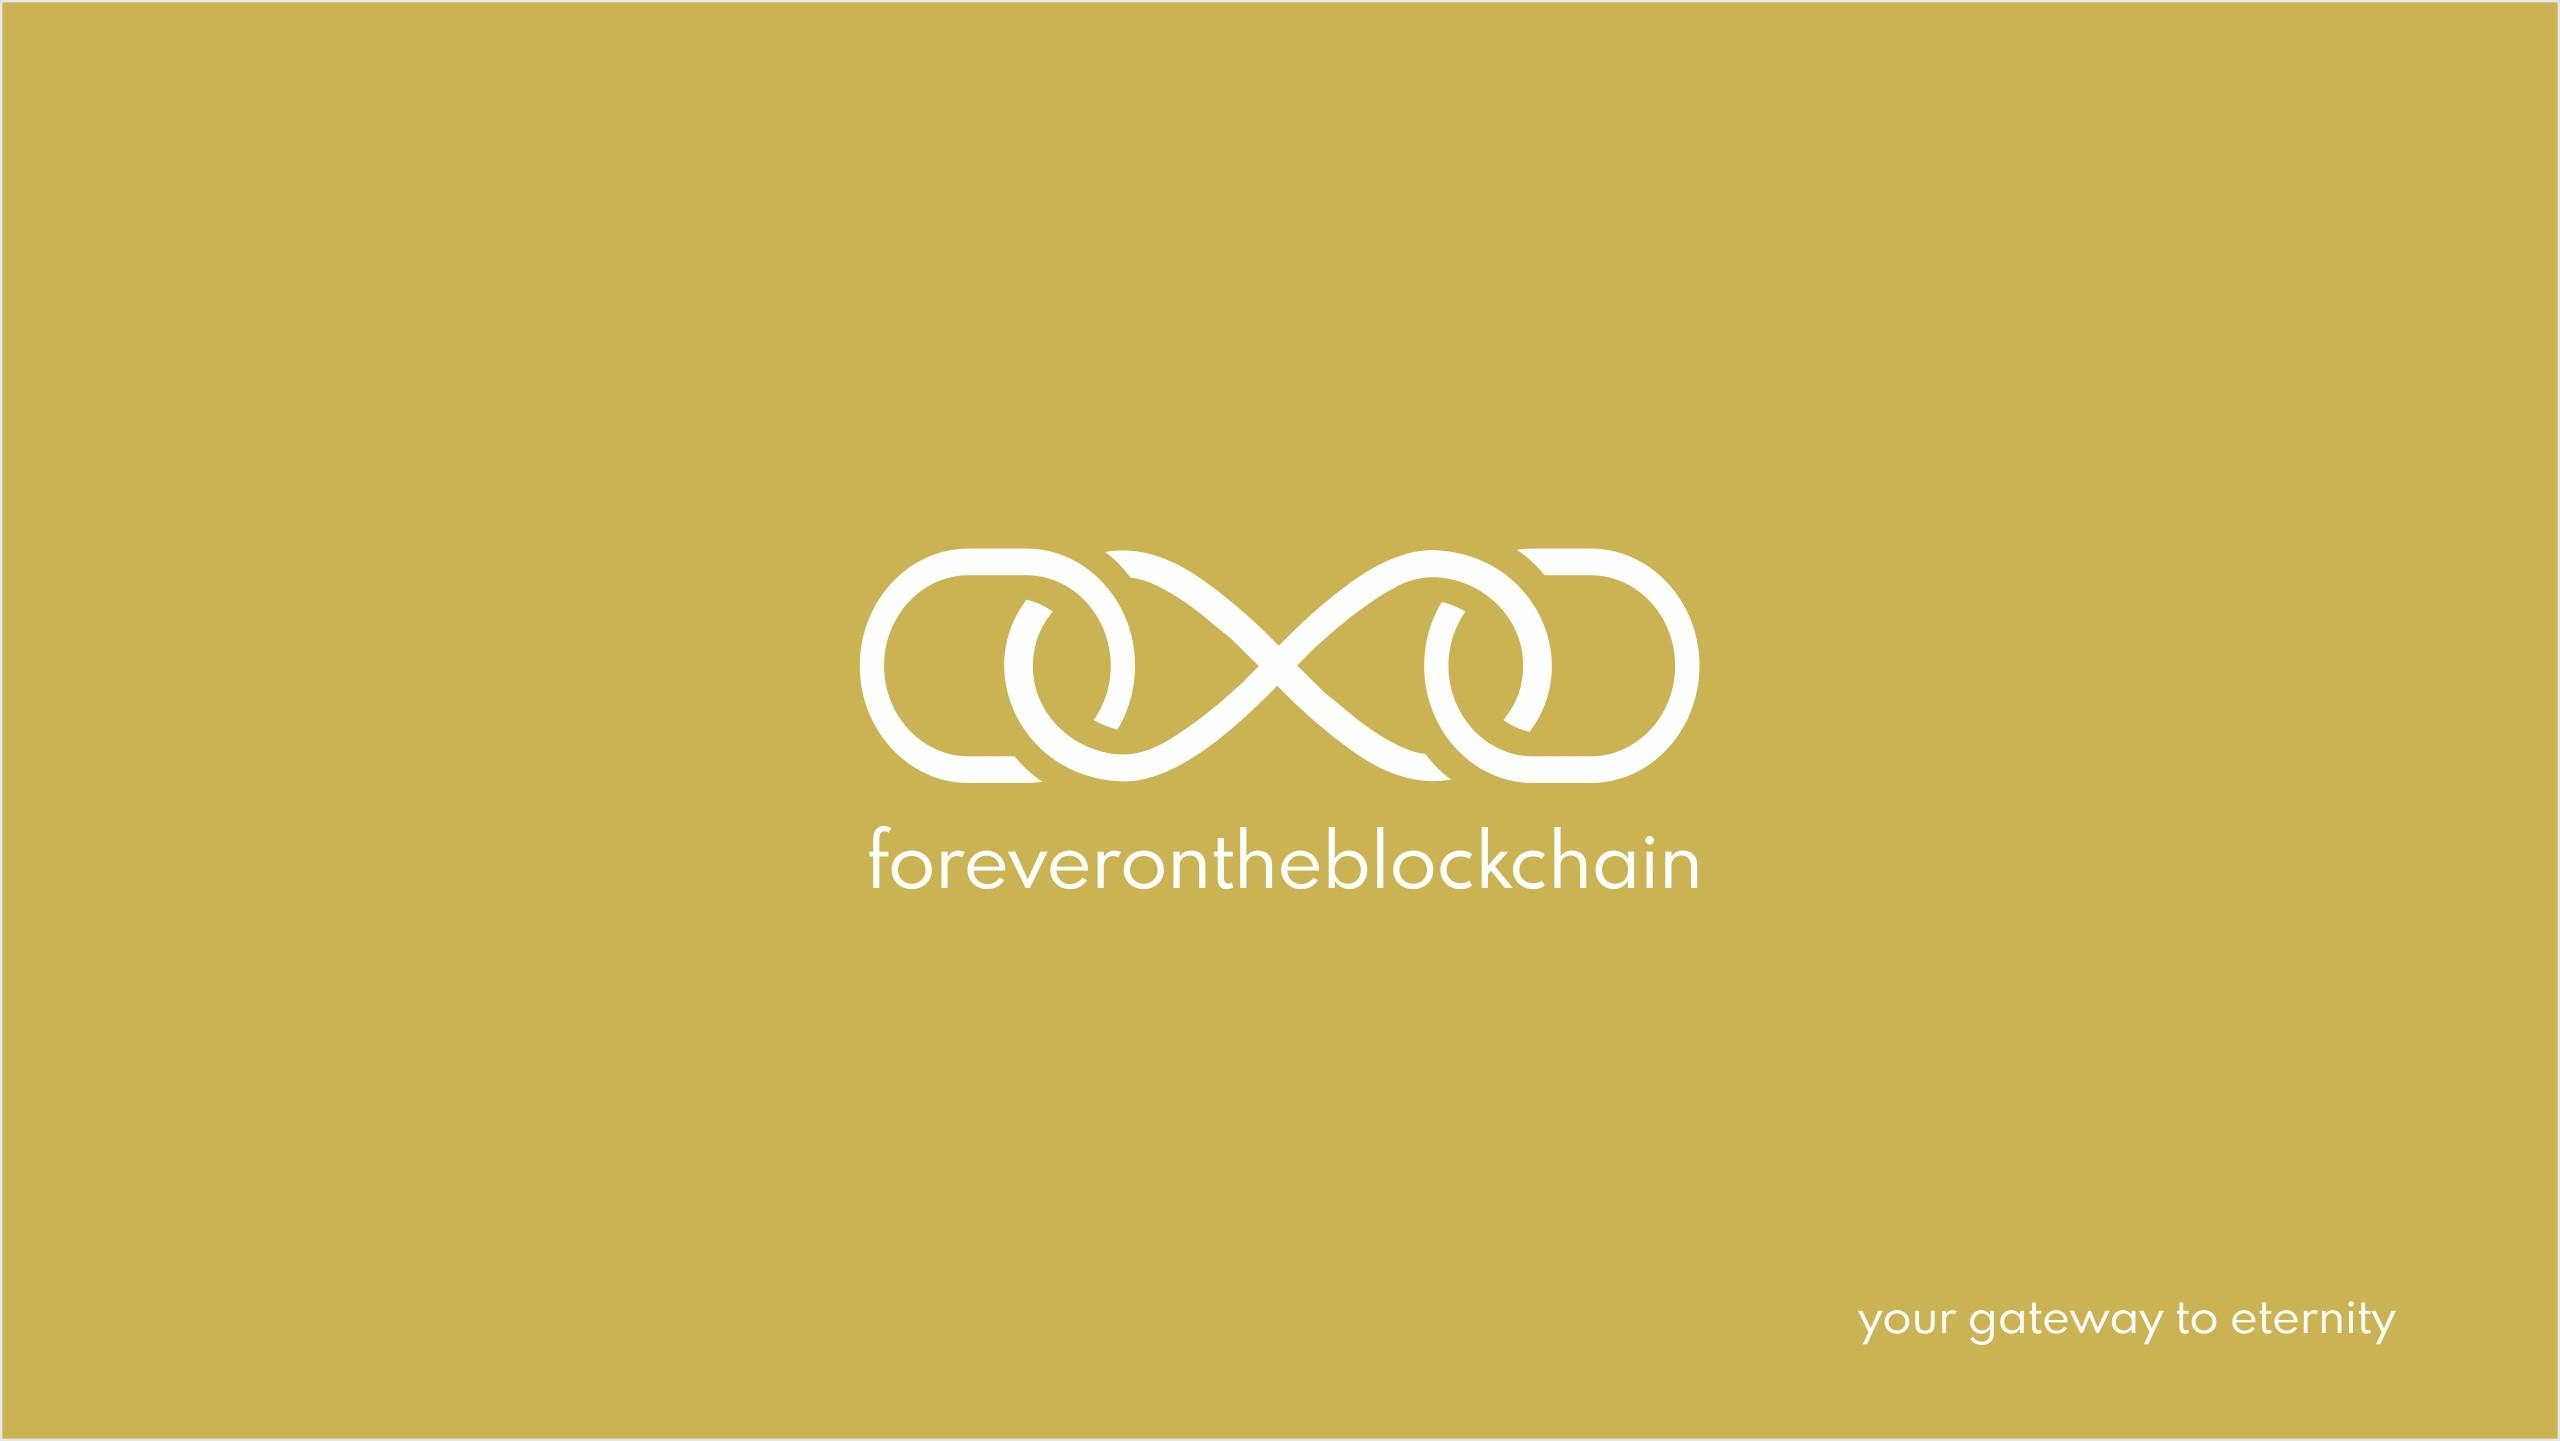 Logo for foreverontheblockchain